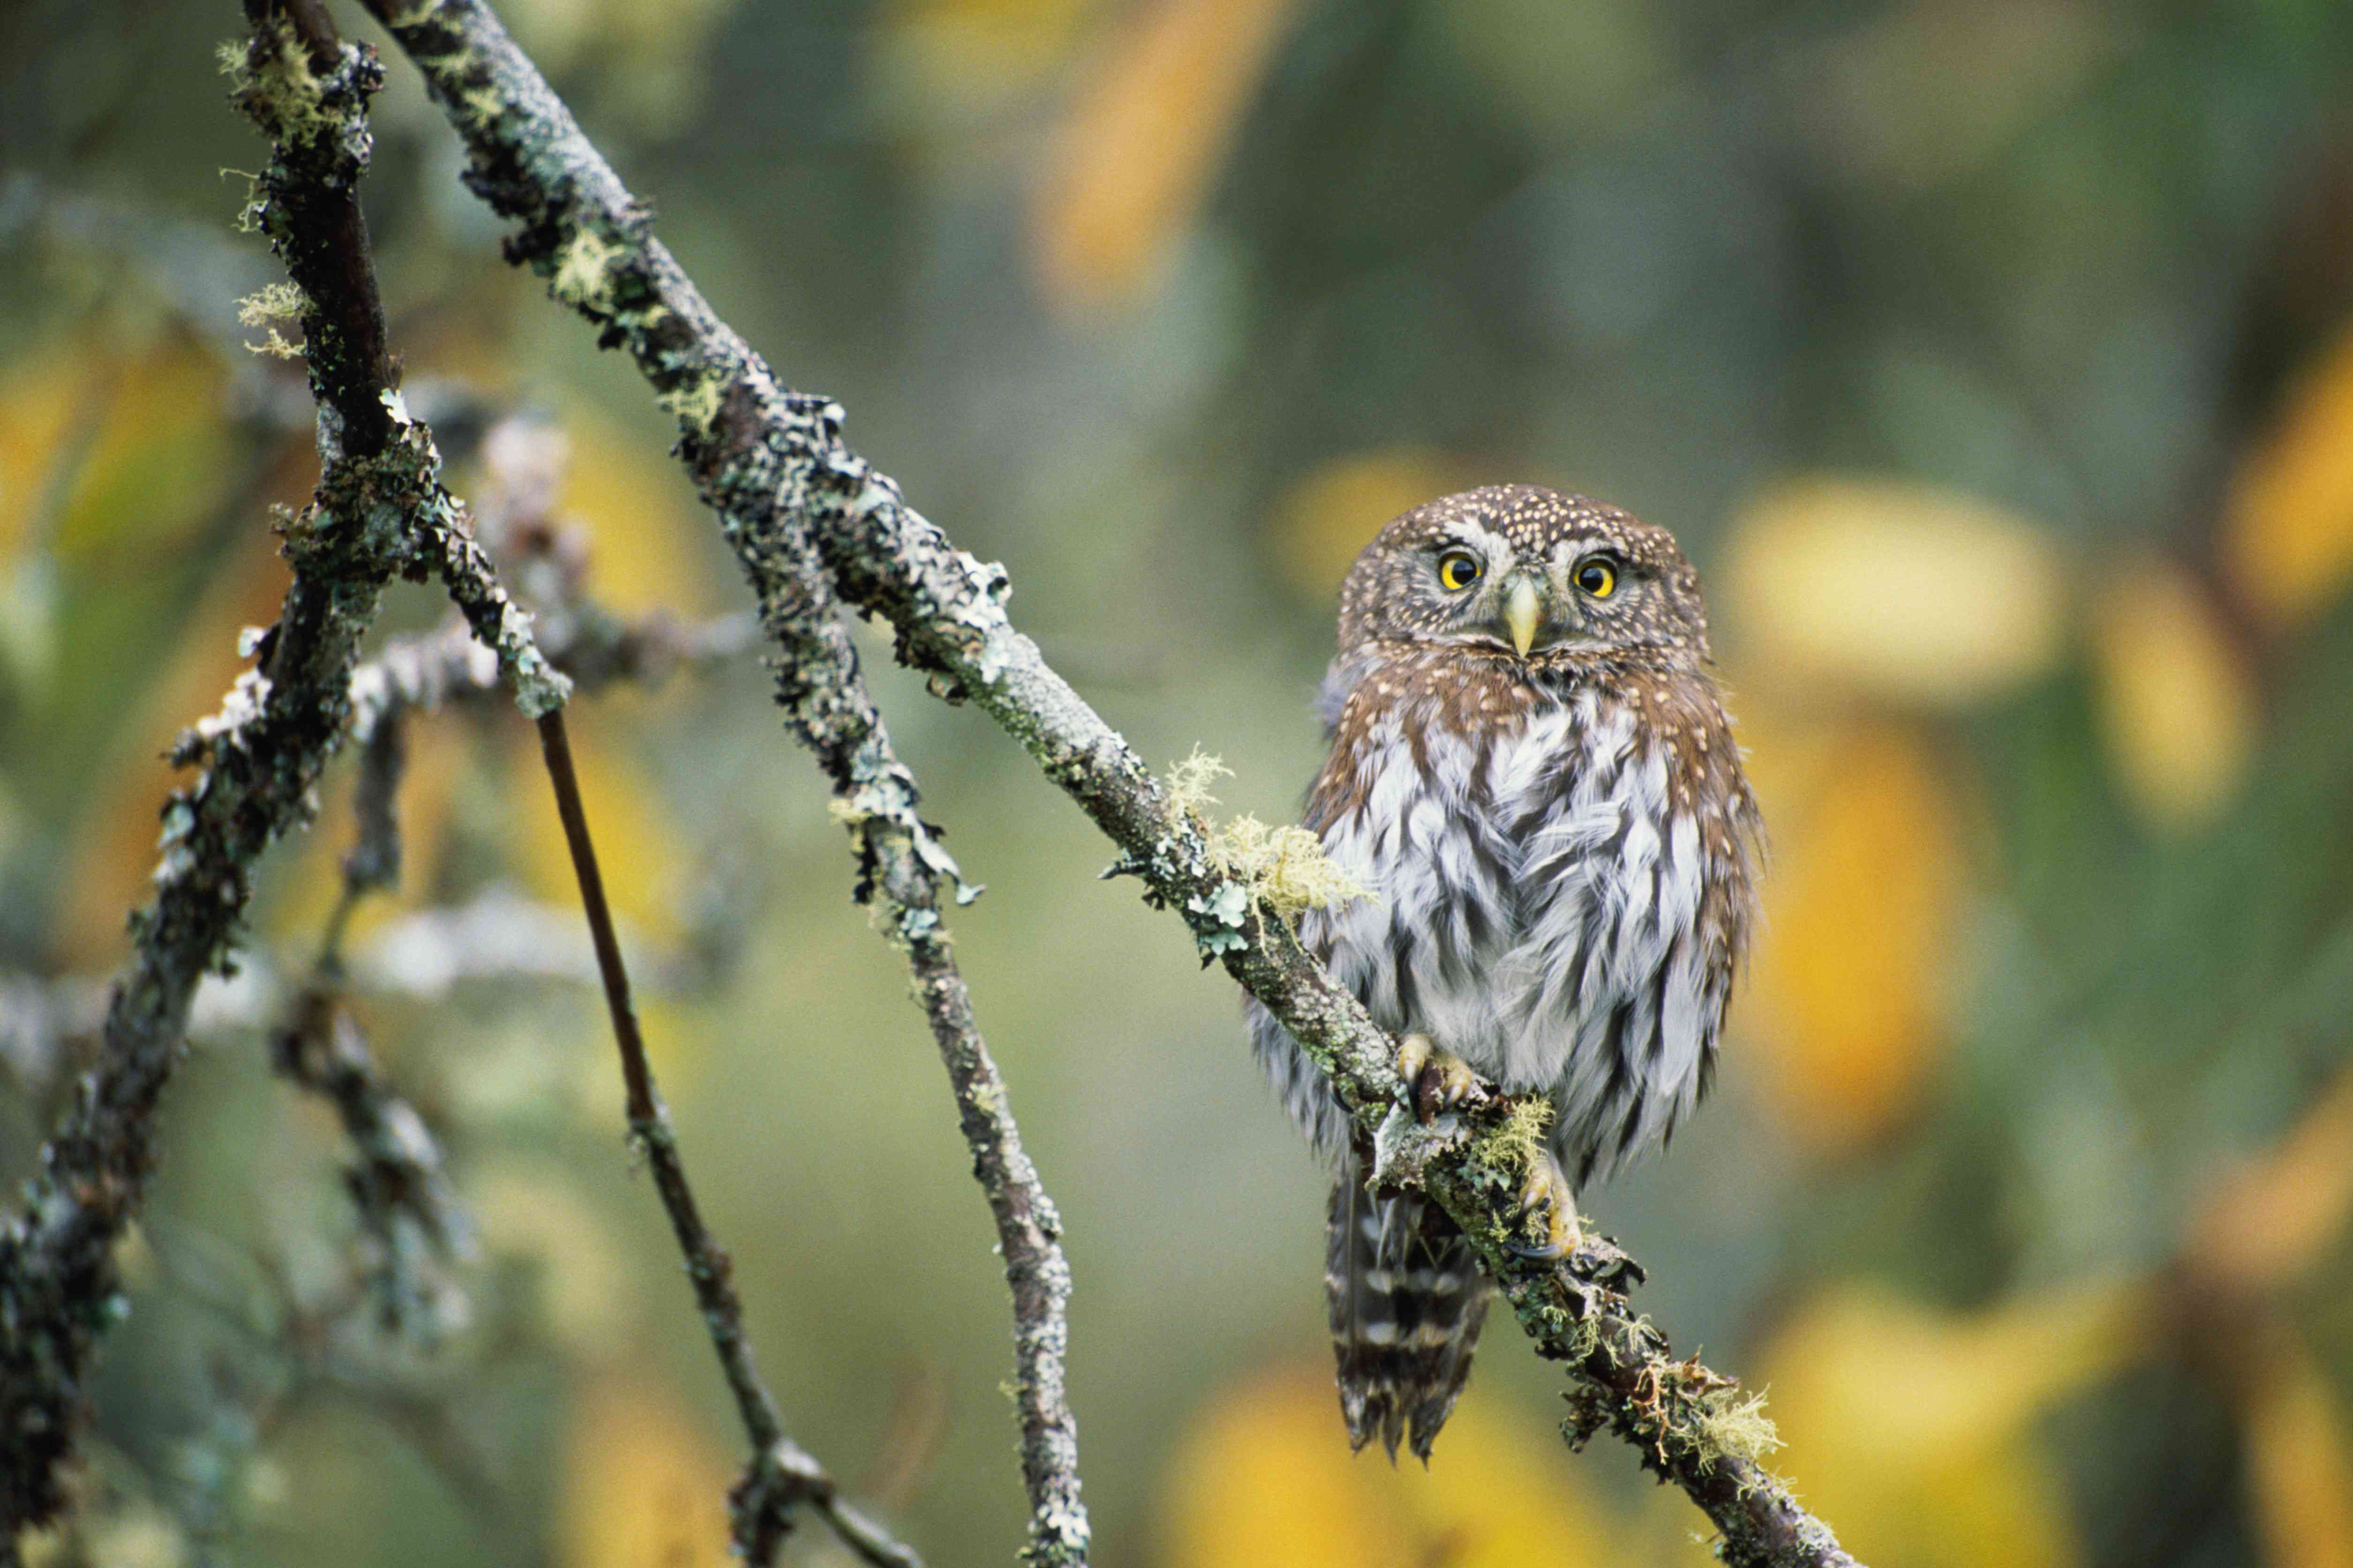 Northern pygmy-owl (Glaucidium gnoma) on tree branch, Washington